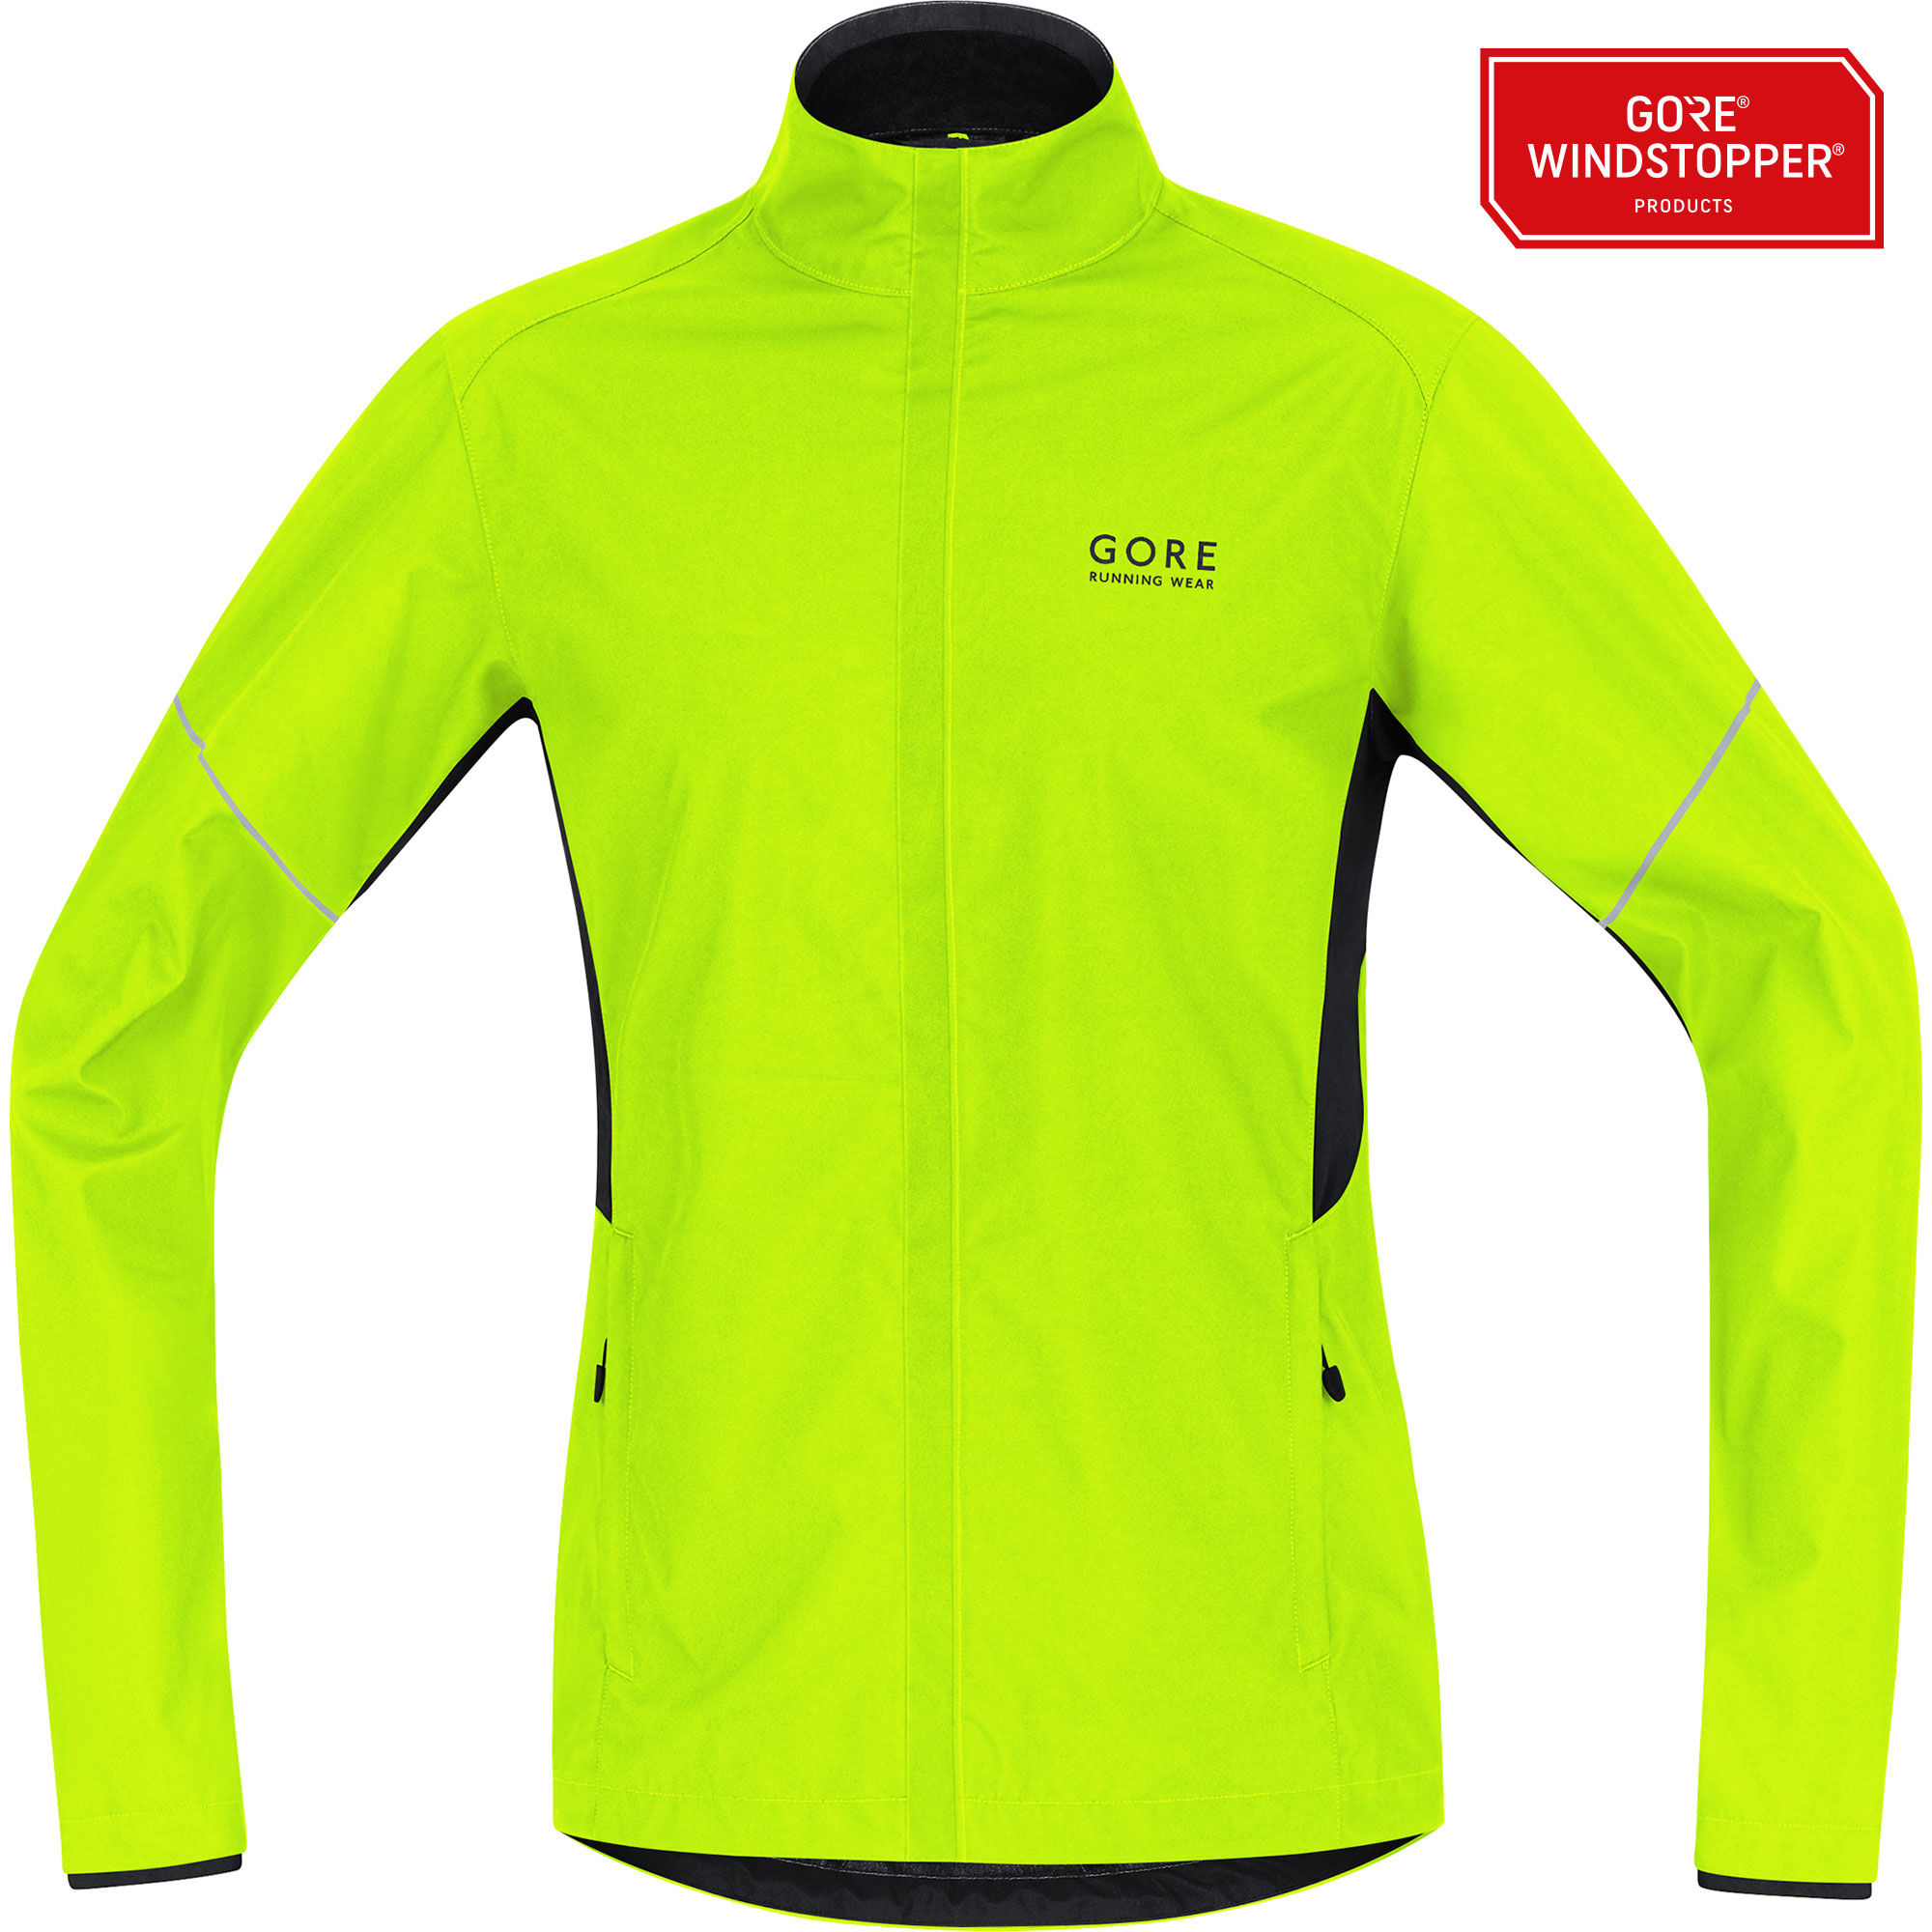 Gore Essential Partial Jacket in Neon Gelb